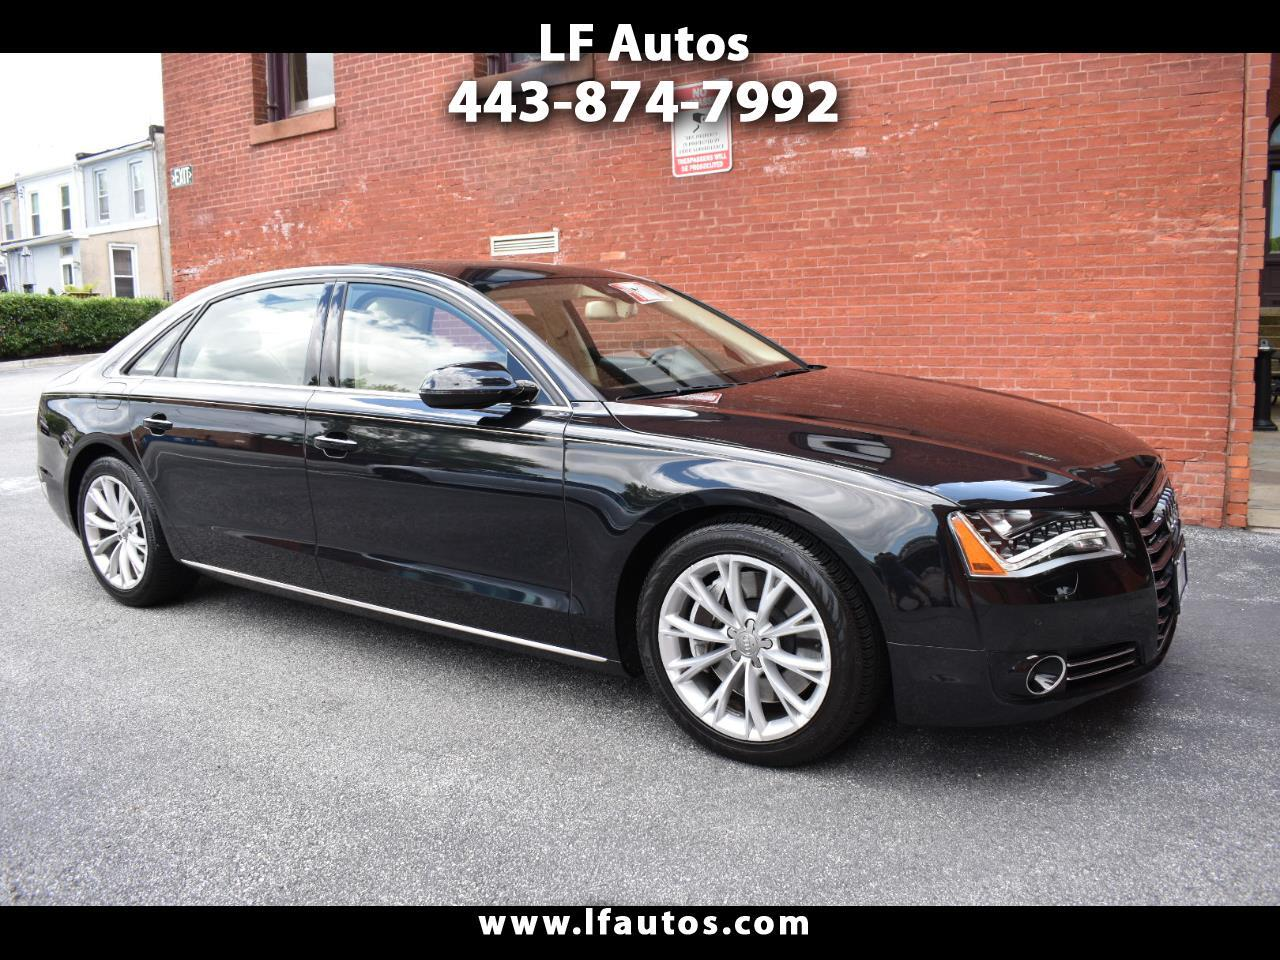 Audi A8 L 4dr Sdn 2011